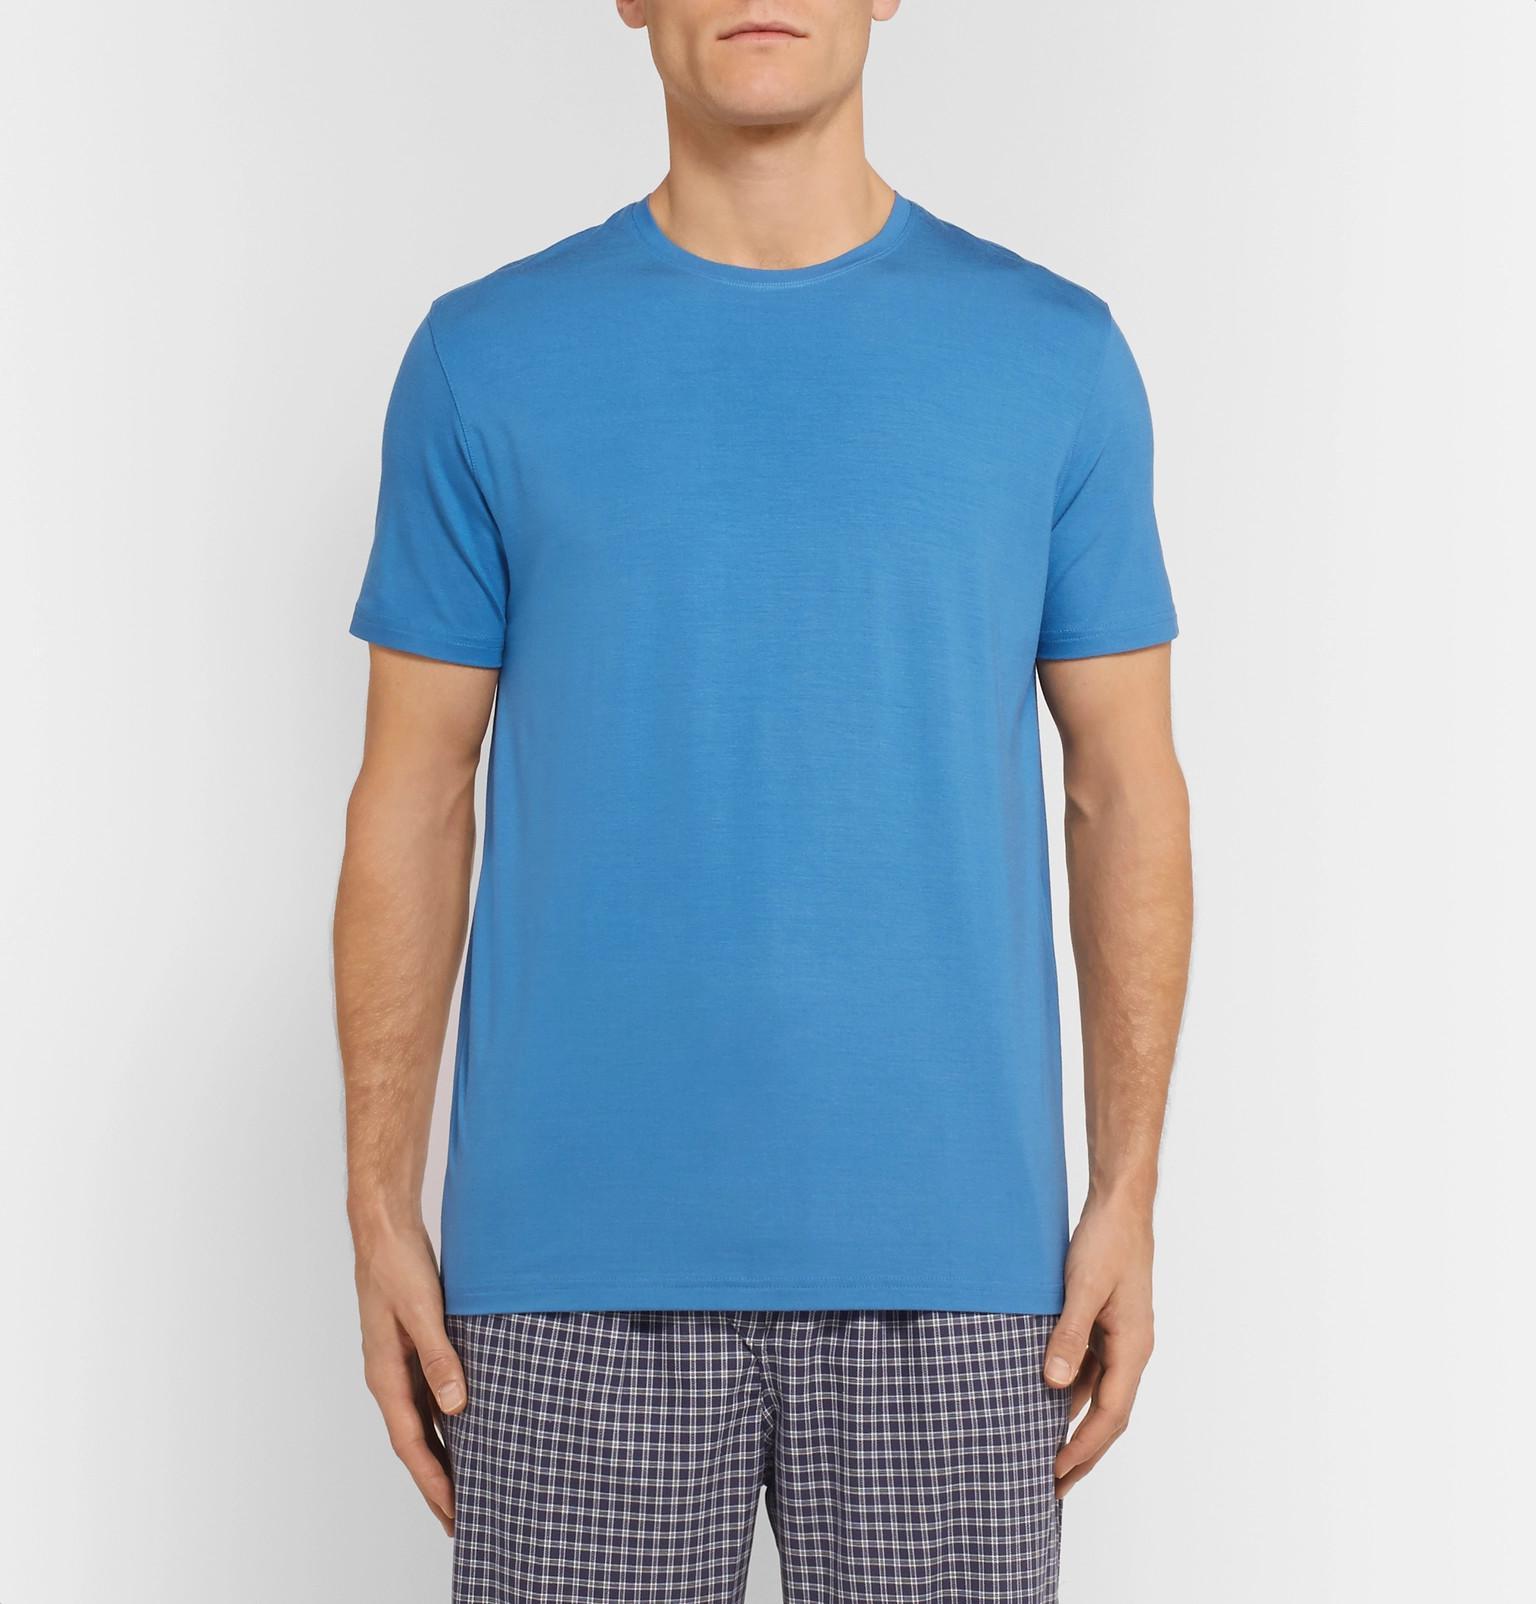 c1dc93d0cf59 Derek Rose Basel Stretch-micro Modal T-shirt in Blue for Men - Lyst